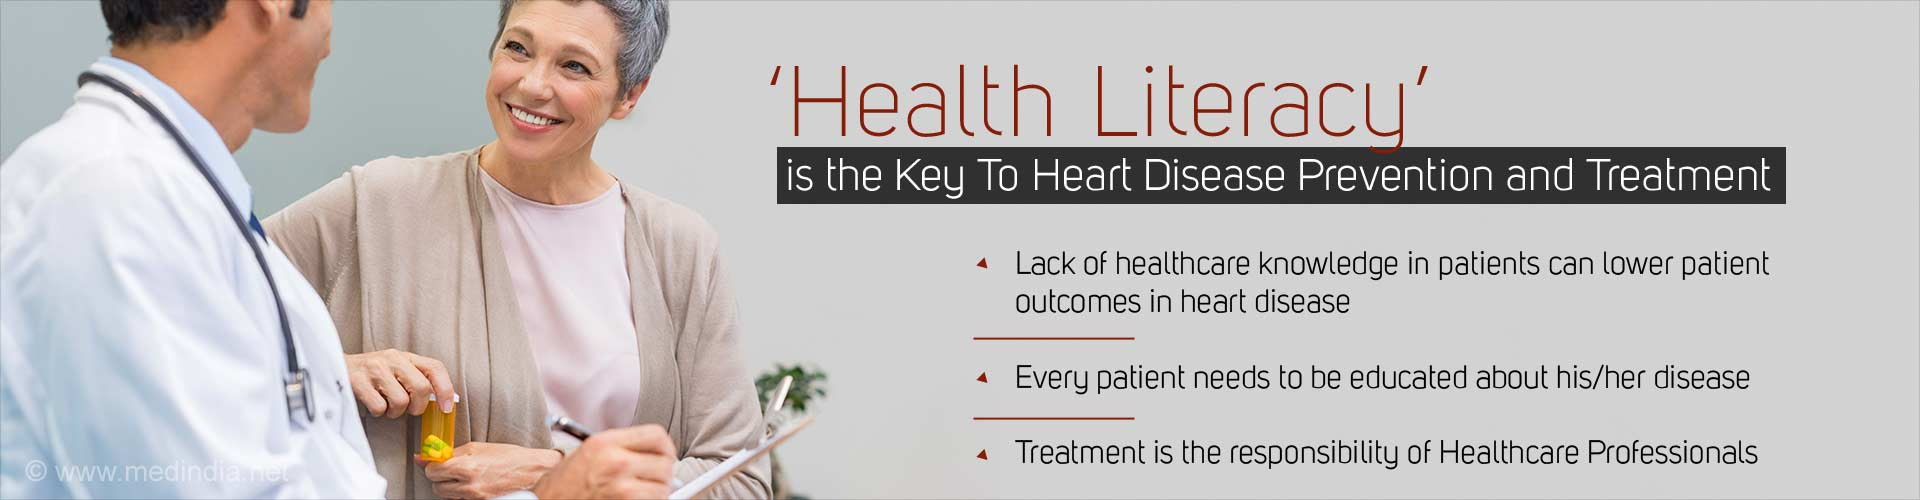 Insufficient Healthcare Knowledge Major Impediment To Heart Disease Management